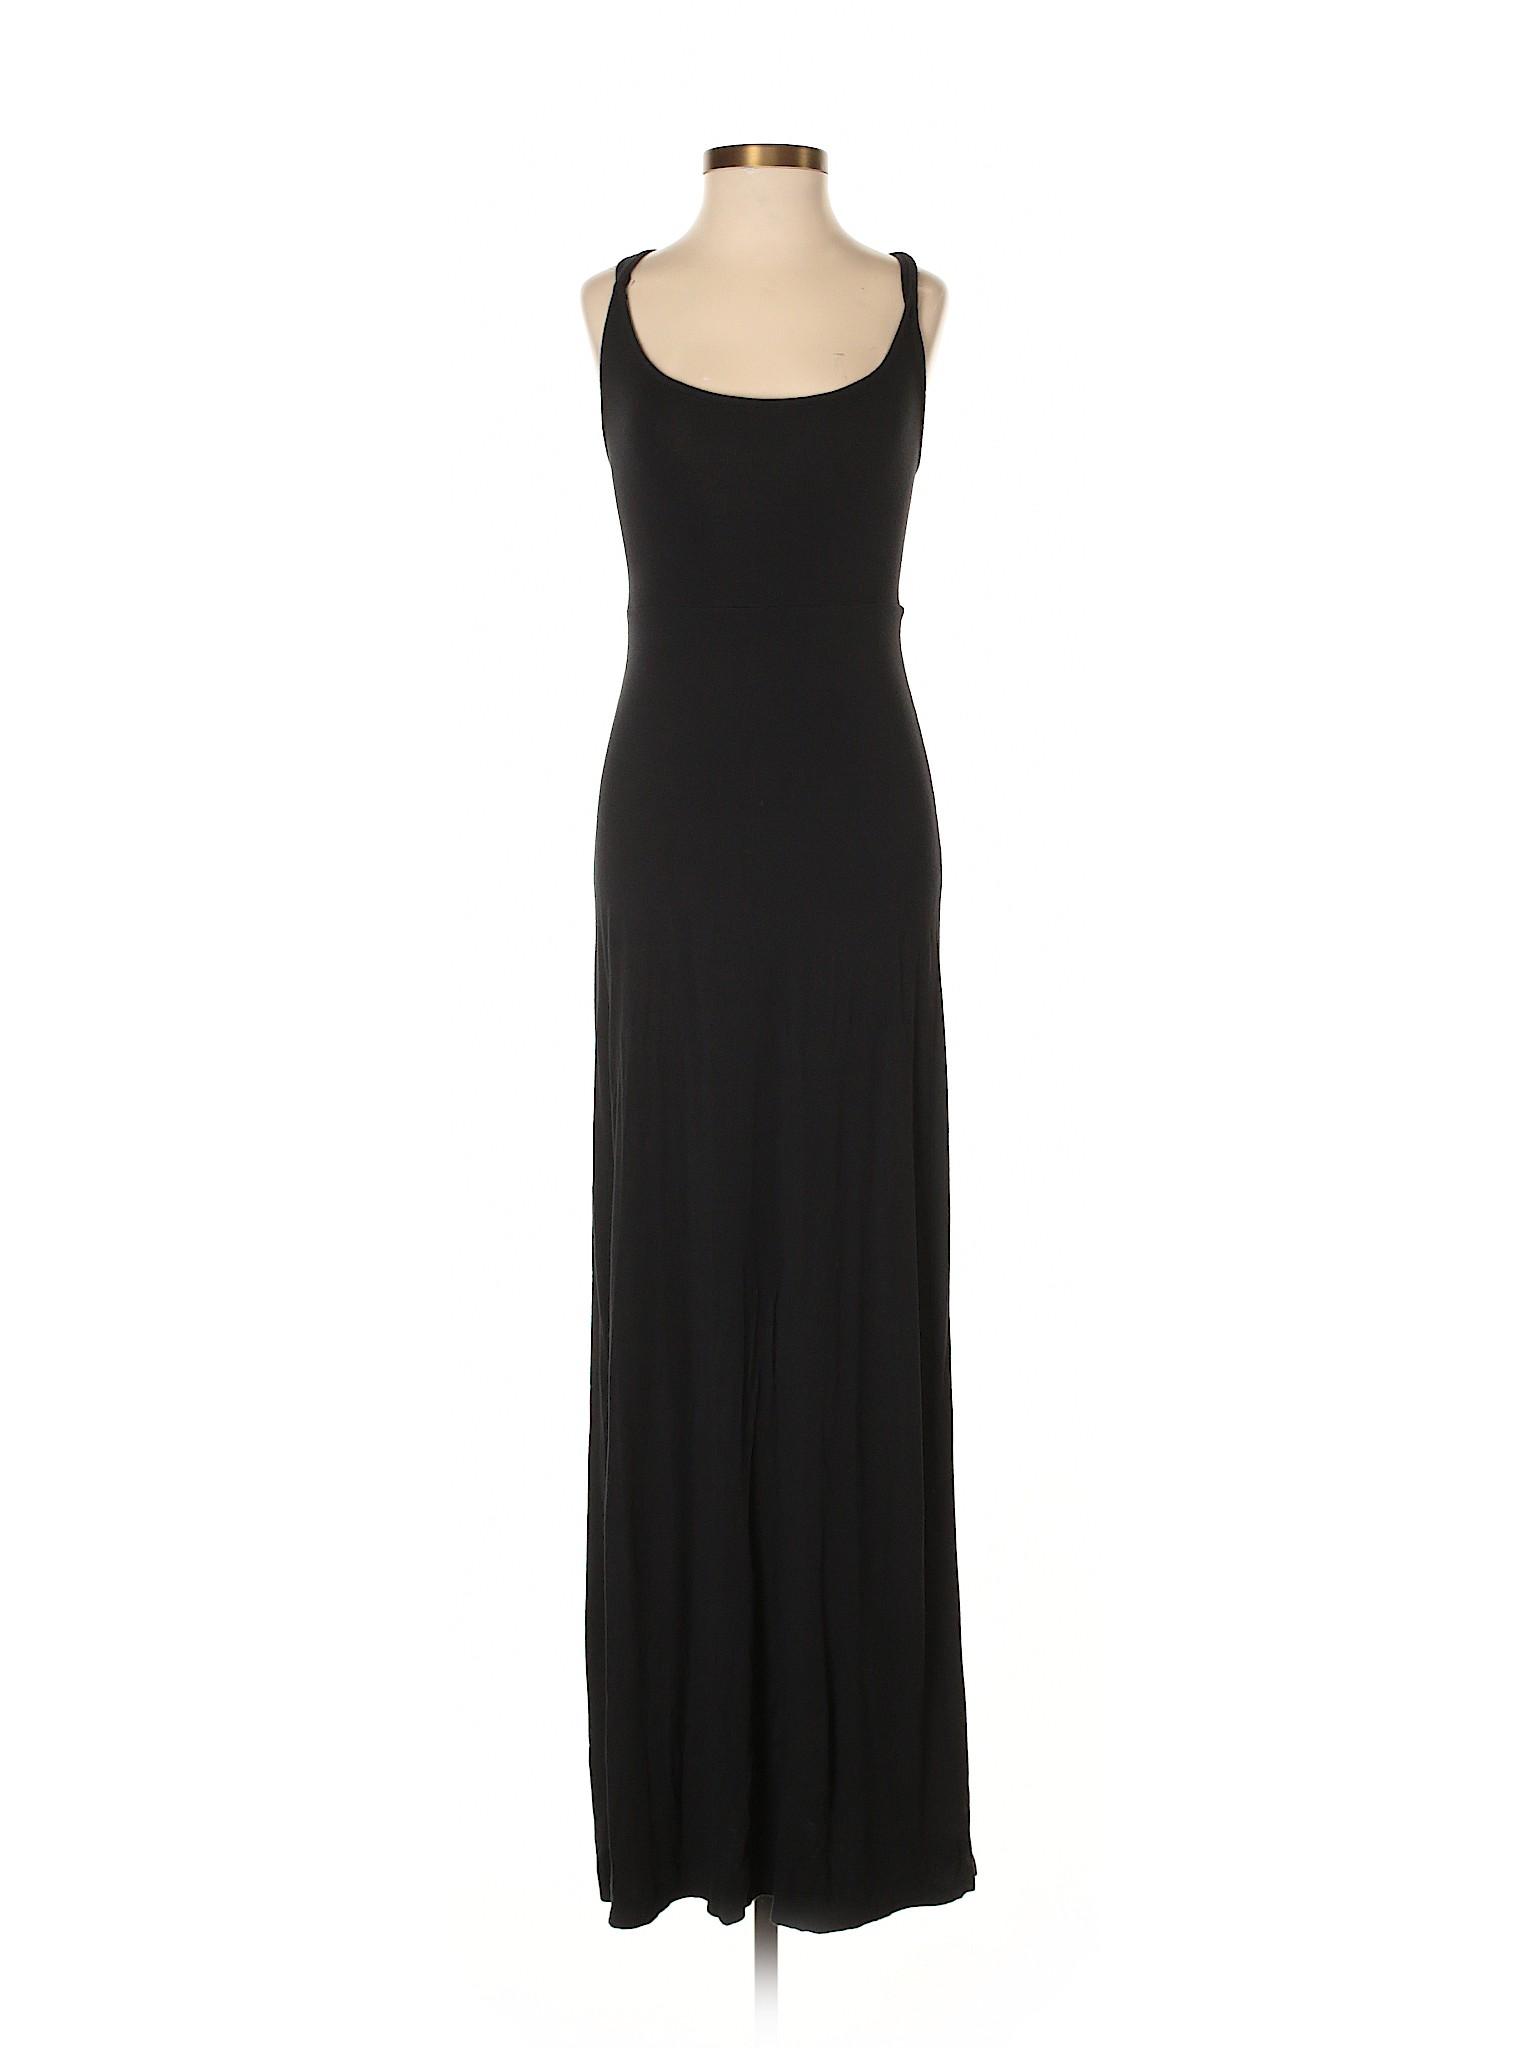 winter Dress Mara Boutique Casual Hoffman YHZHq4